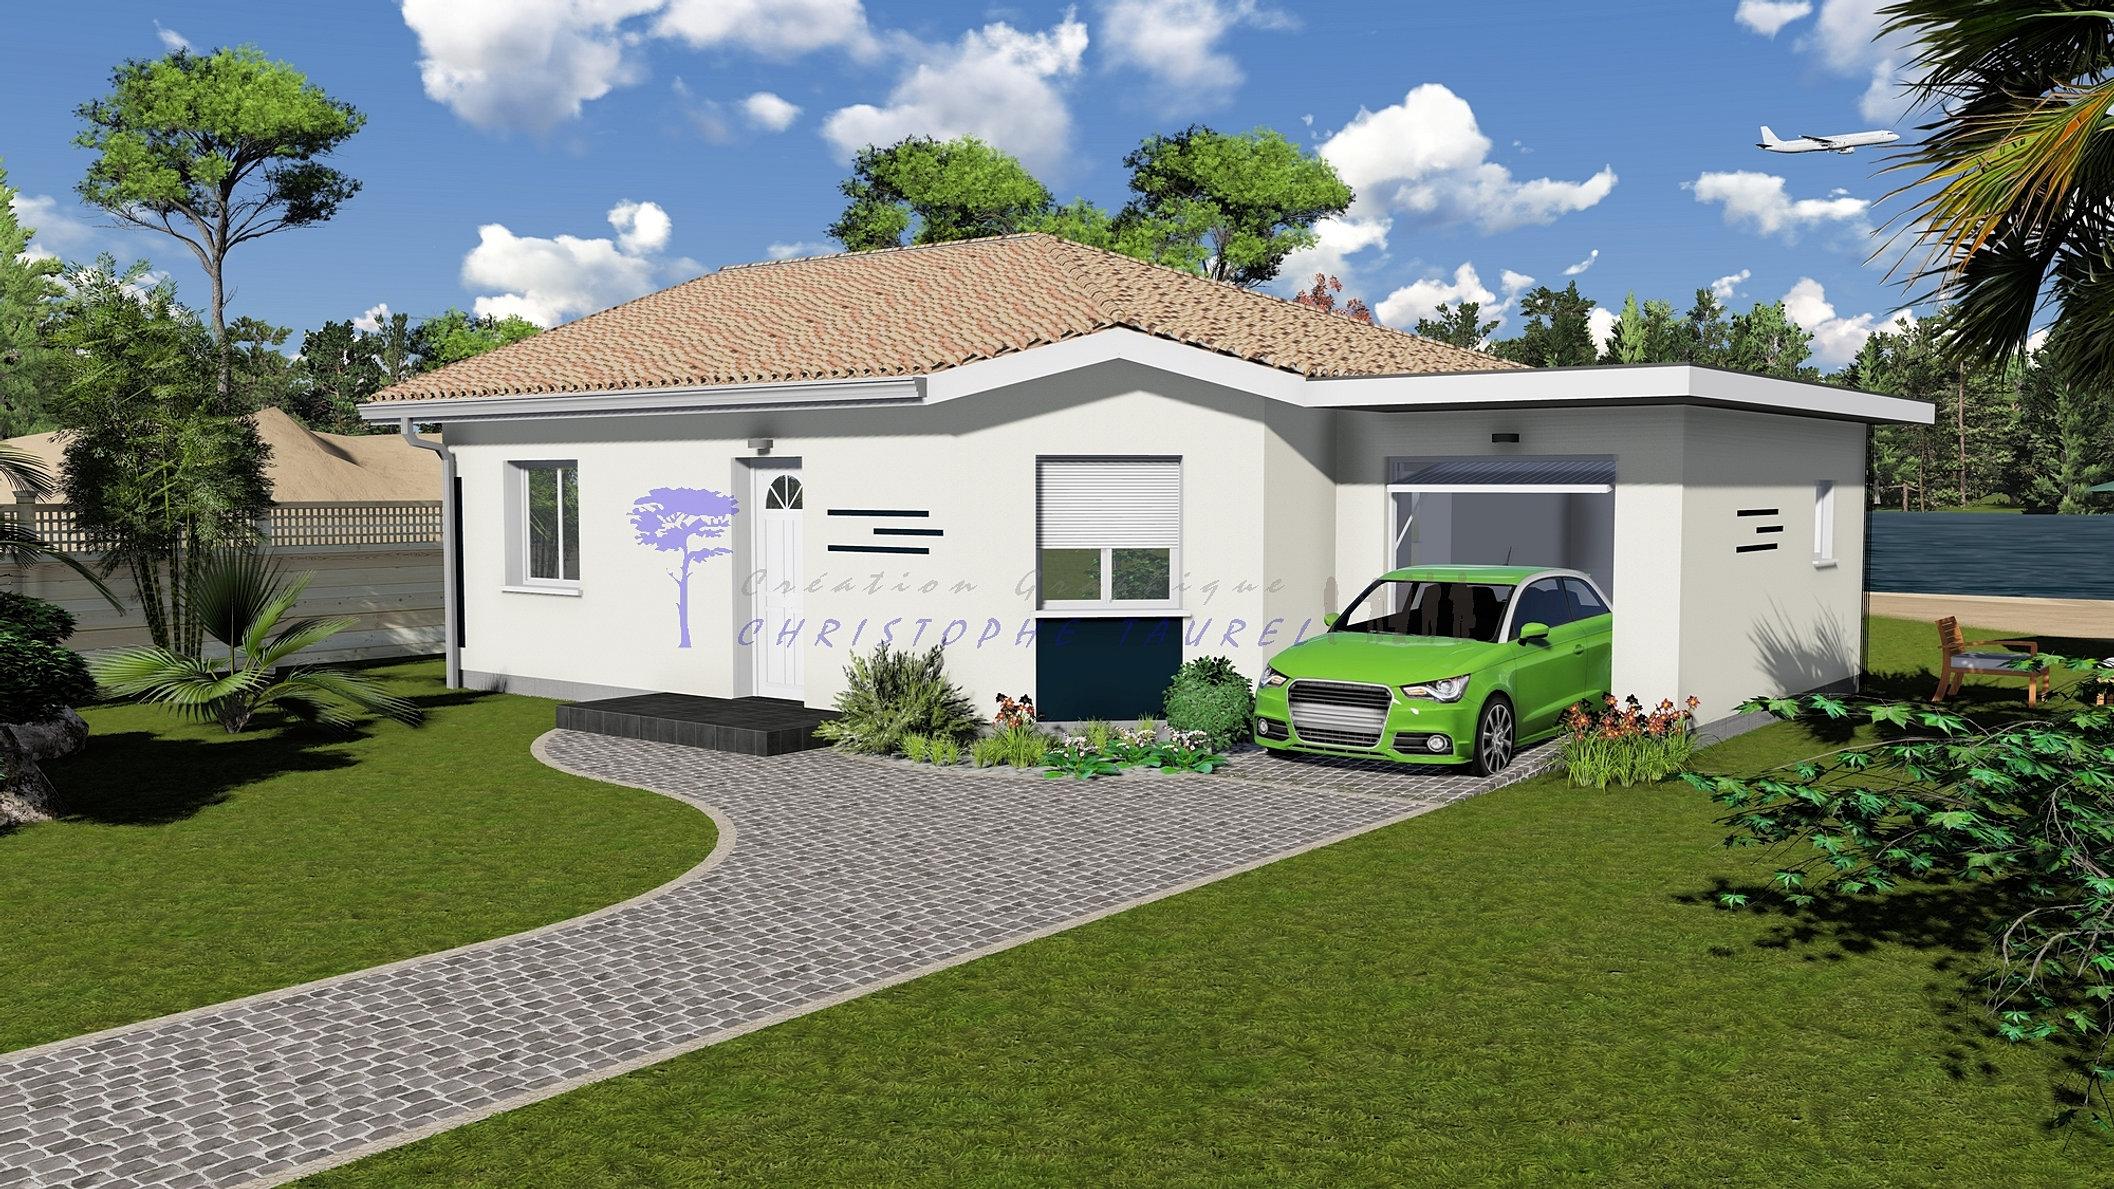 Constructeur parentis en born biscarrosse constructions taurel ch for Constructeur piscine tarif